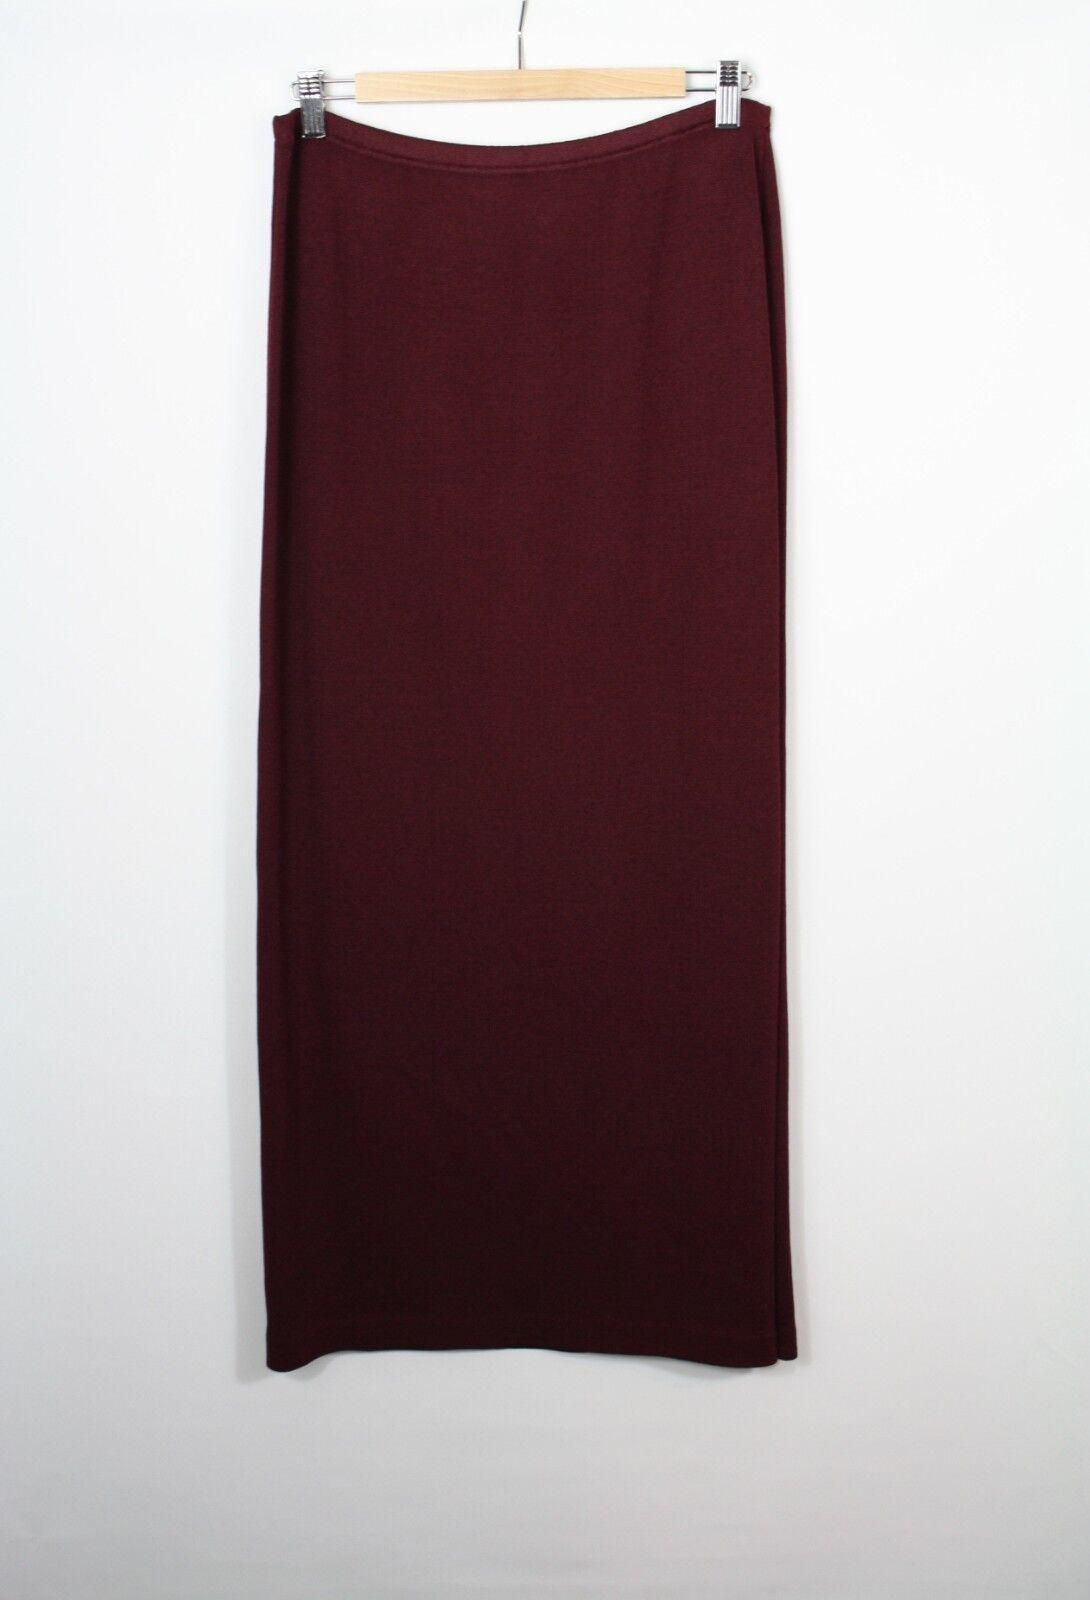 St. John Evening Santana Knit Garnet Purple Long Straight Maxi Skirt Size 6 New